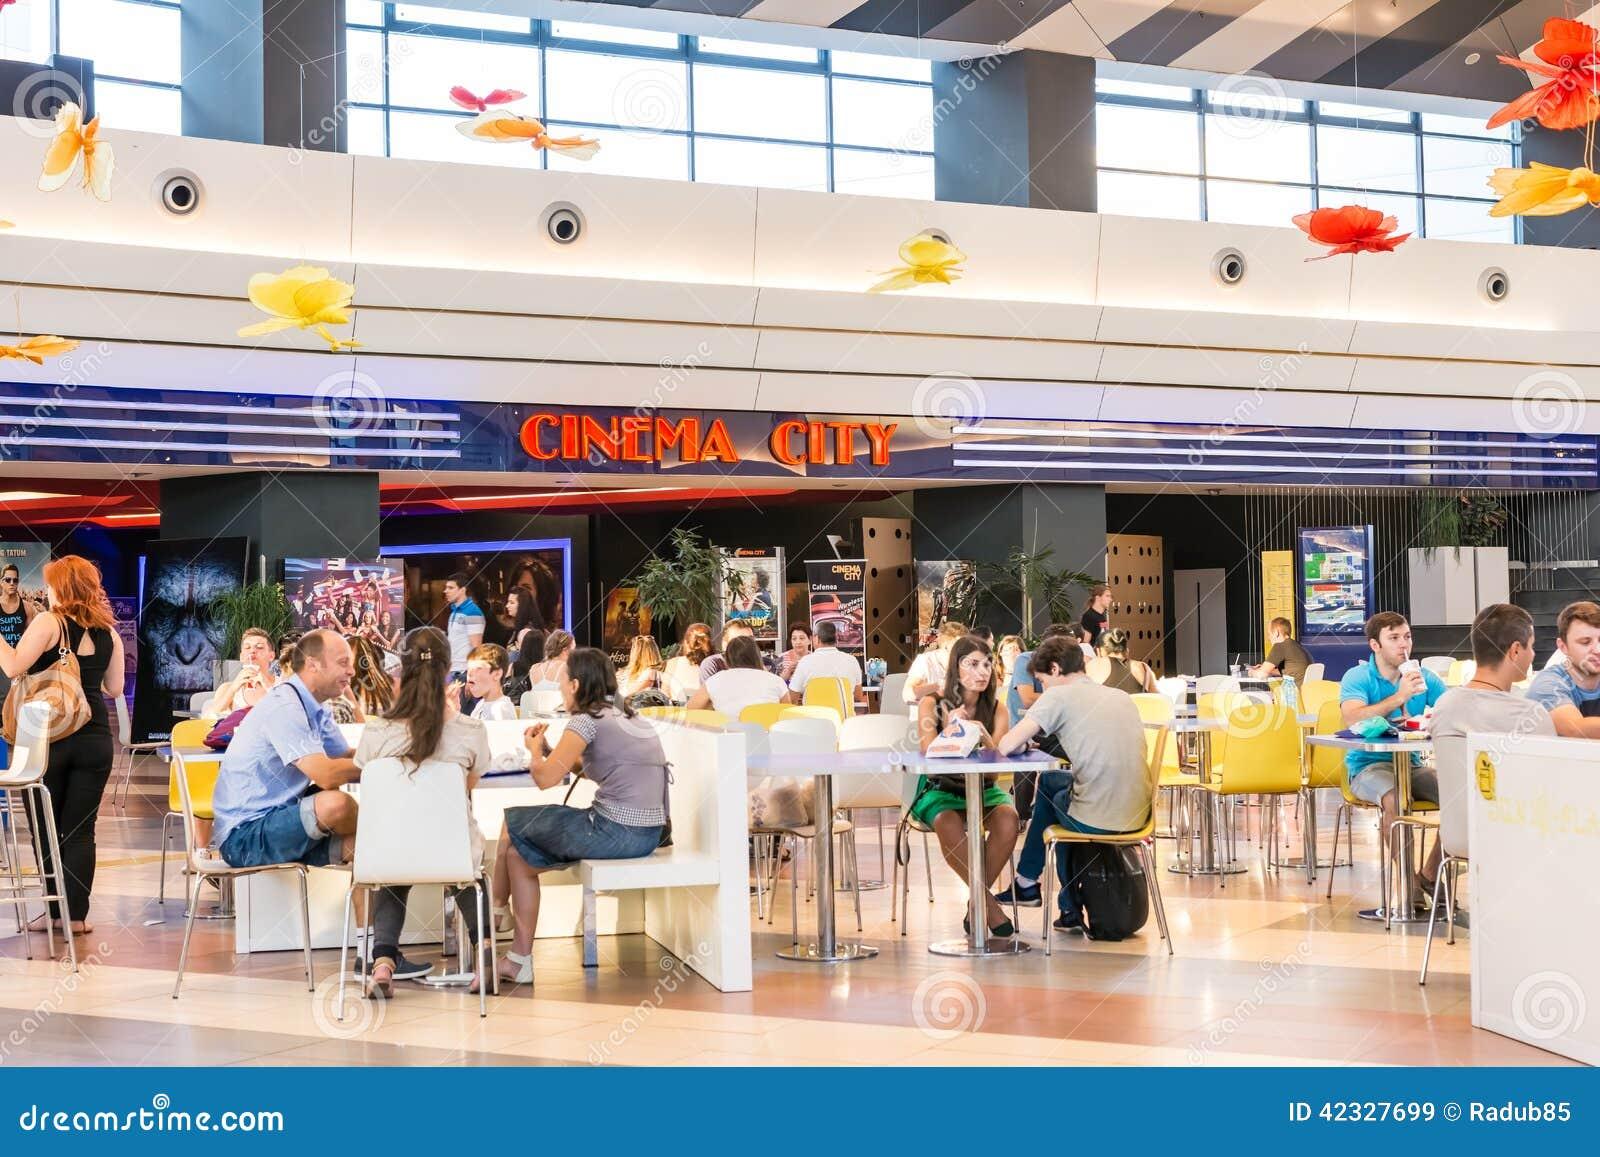 business plan movie theater restaurant seattle